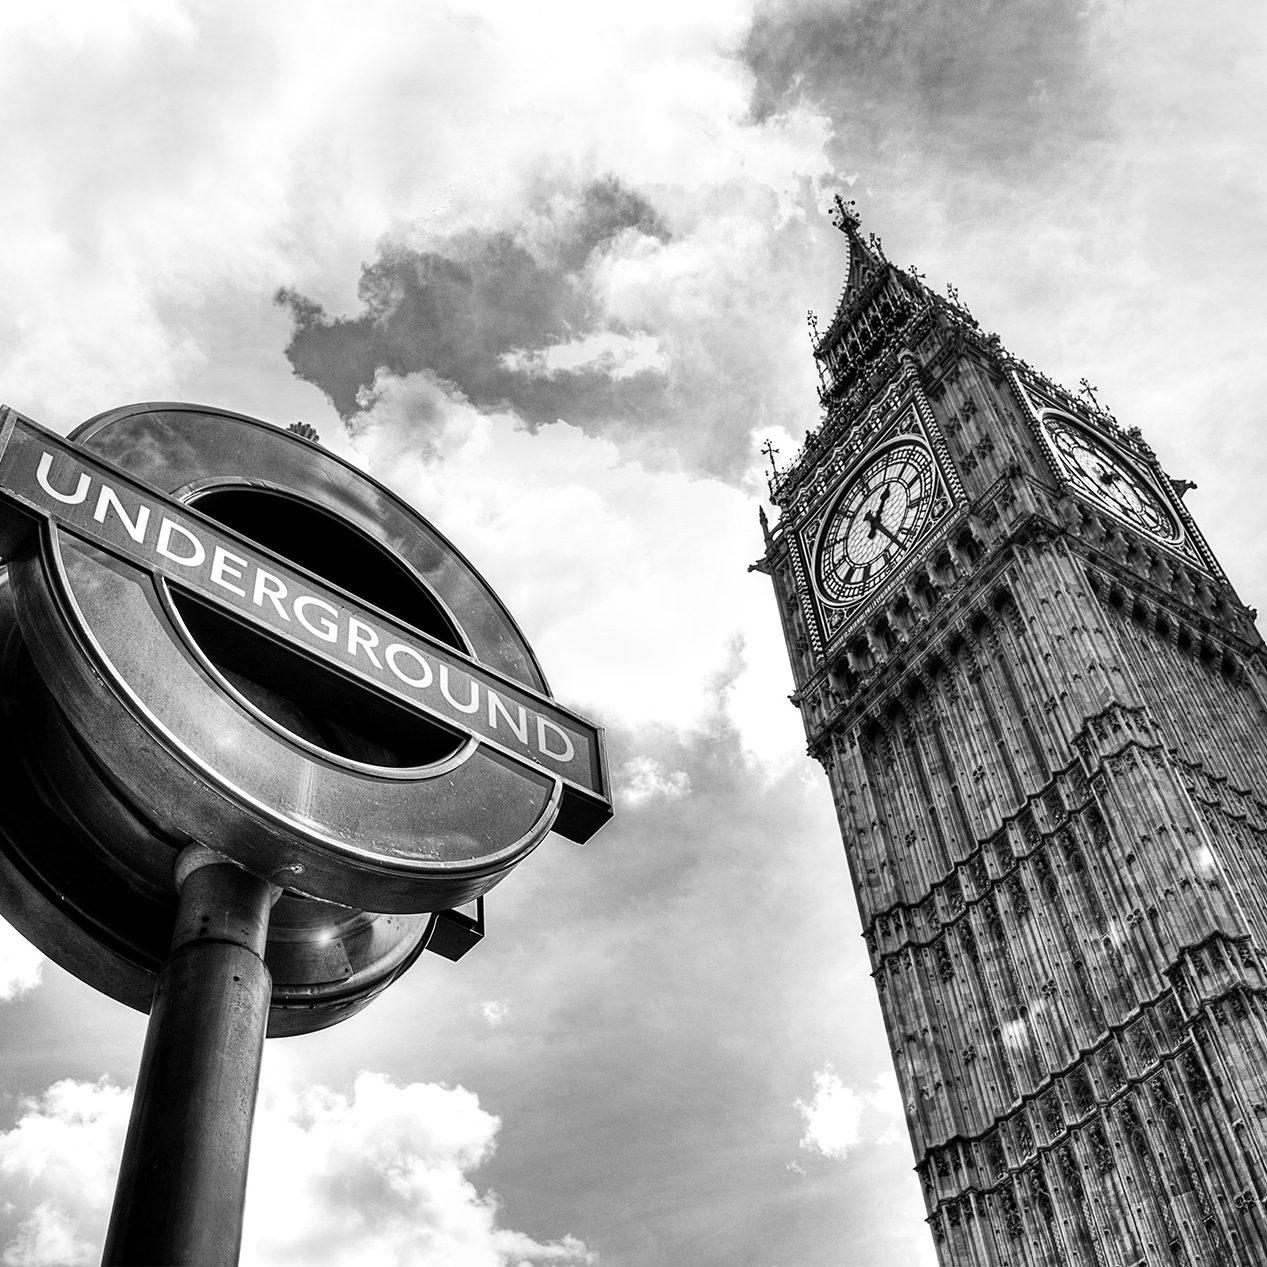 londres london big ben clock horloge westminster tour Royaume-Uni England Tamise great bell tower nikon d800 black and white noir et blanc photographie photography travel europe métro underground